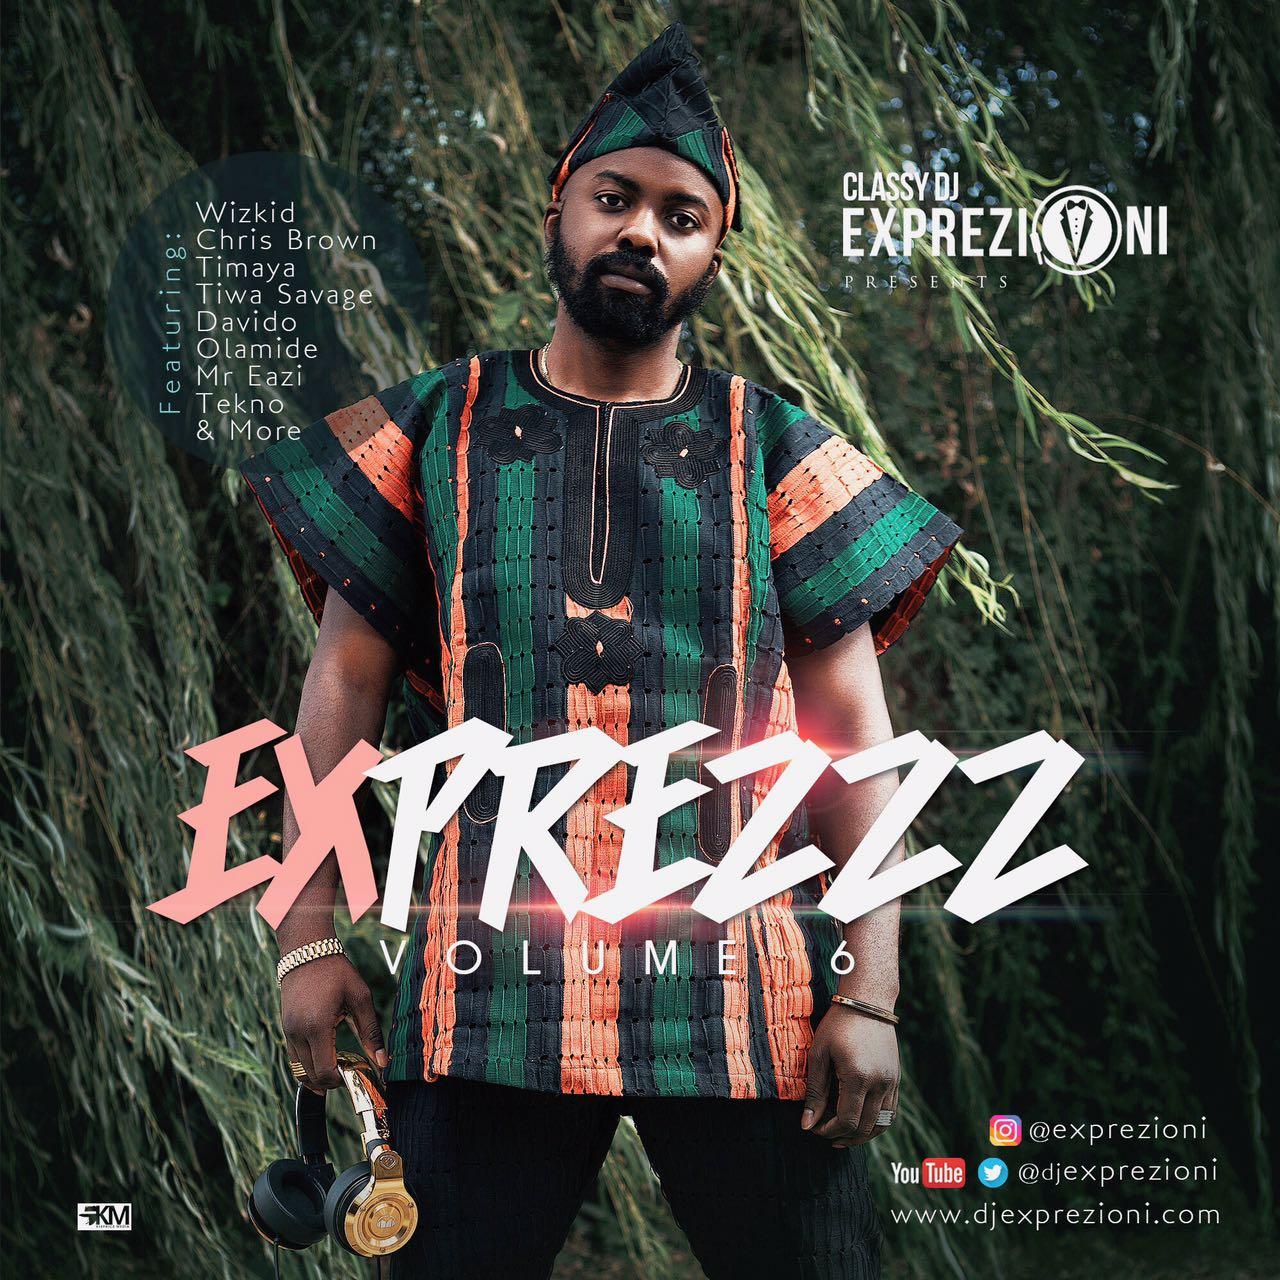 Classy DJ Exprezioni - Exprezzz Vol.6 Mixtape | DOWNLOAD